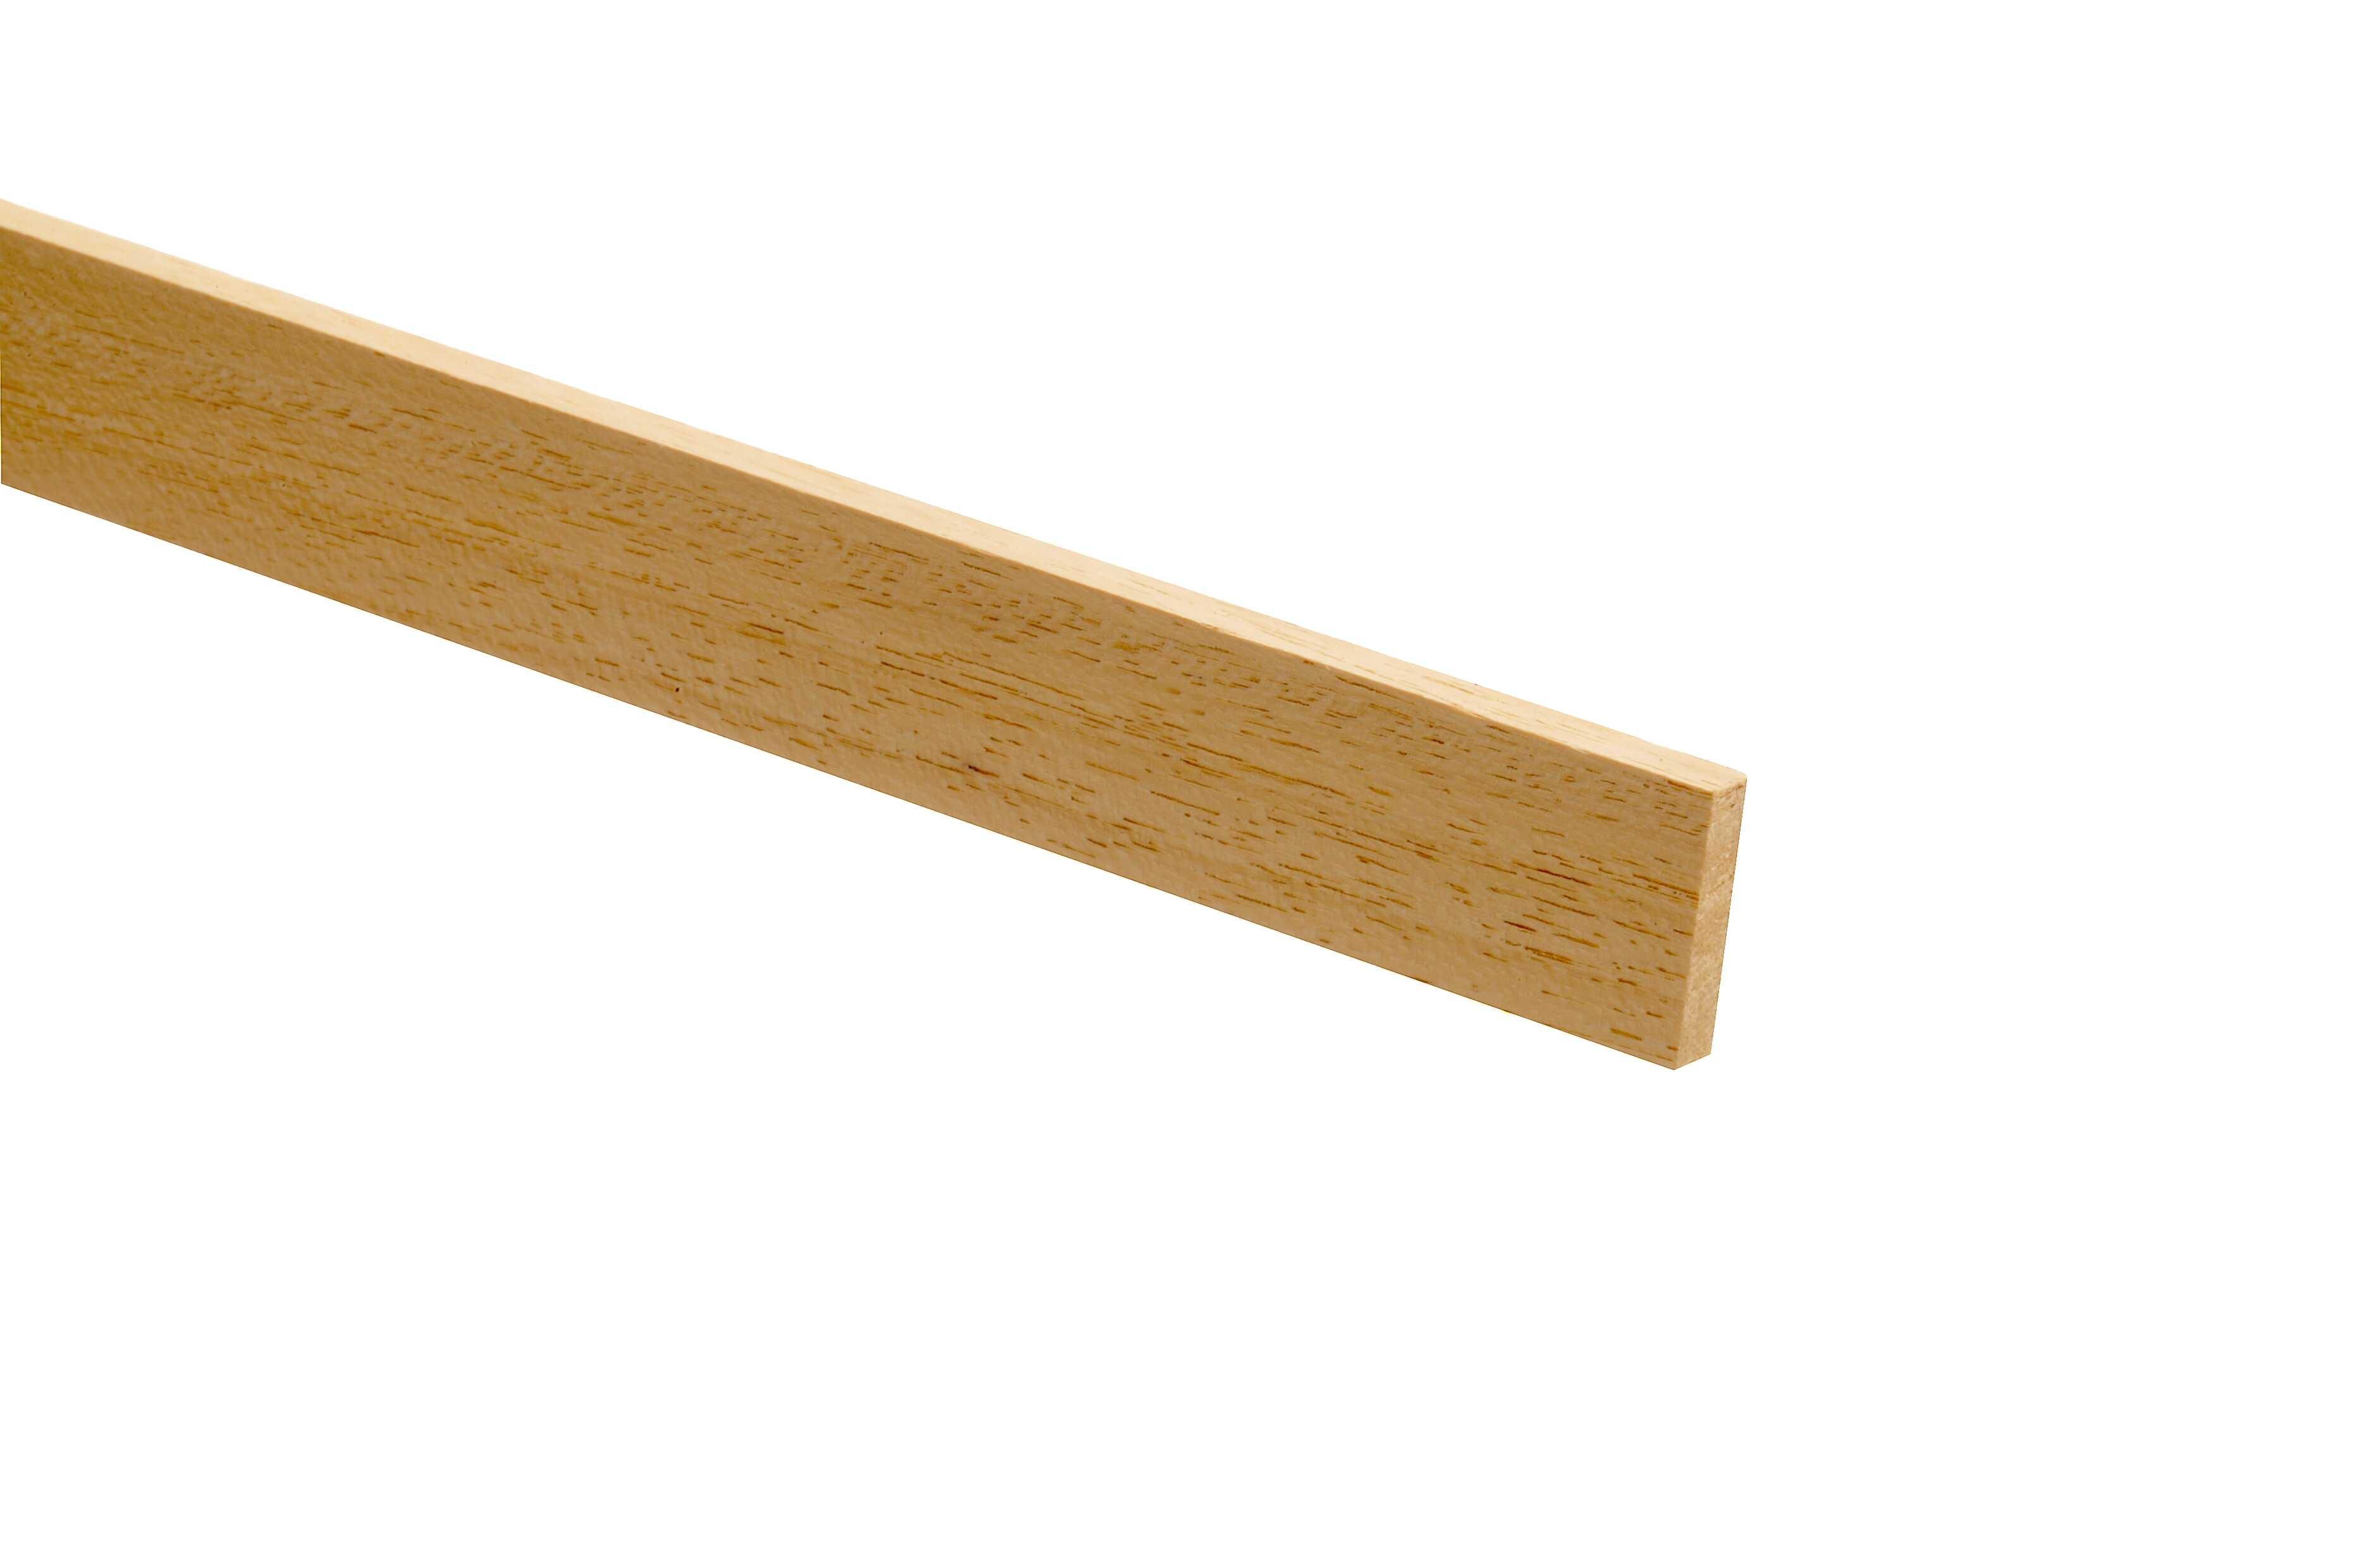 10 Light Hardwood PSE Stripwood 12 x 25 x 2400mm